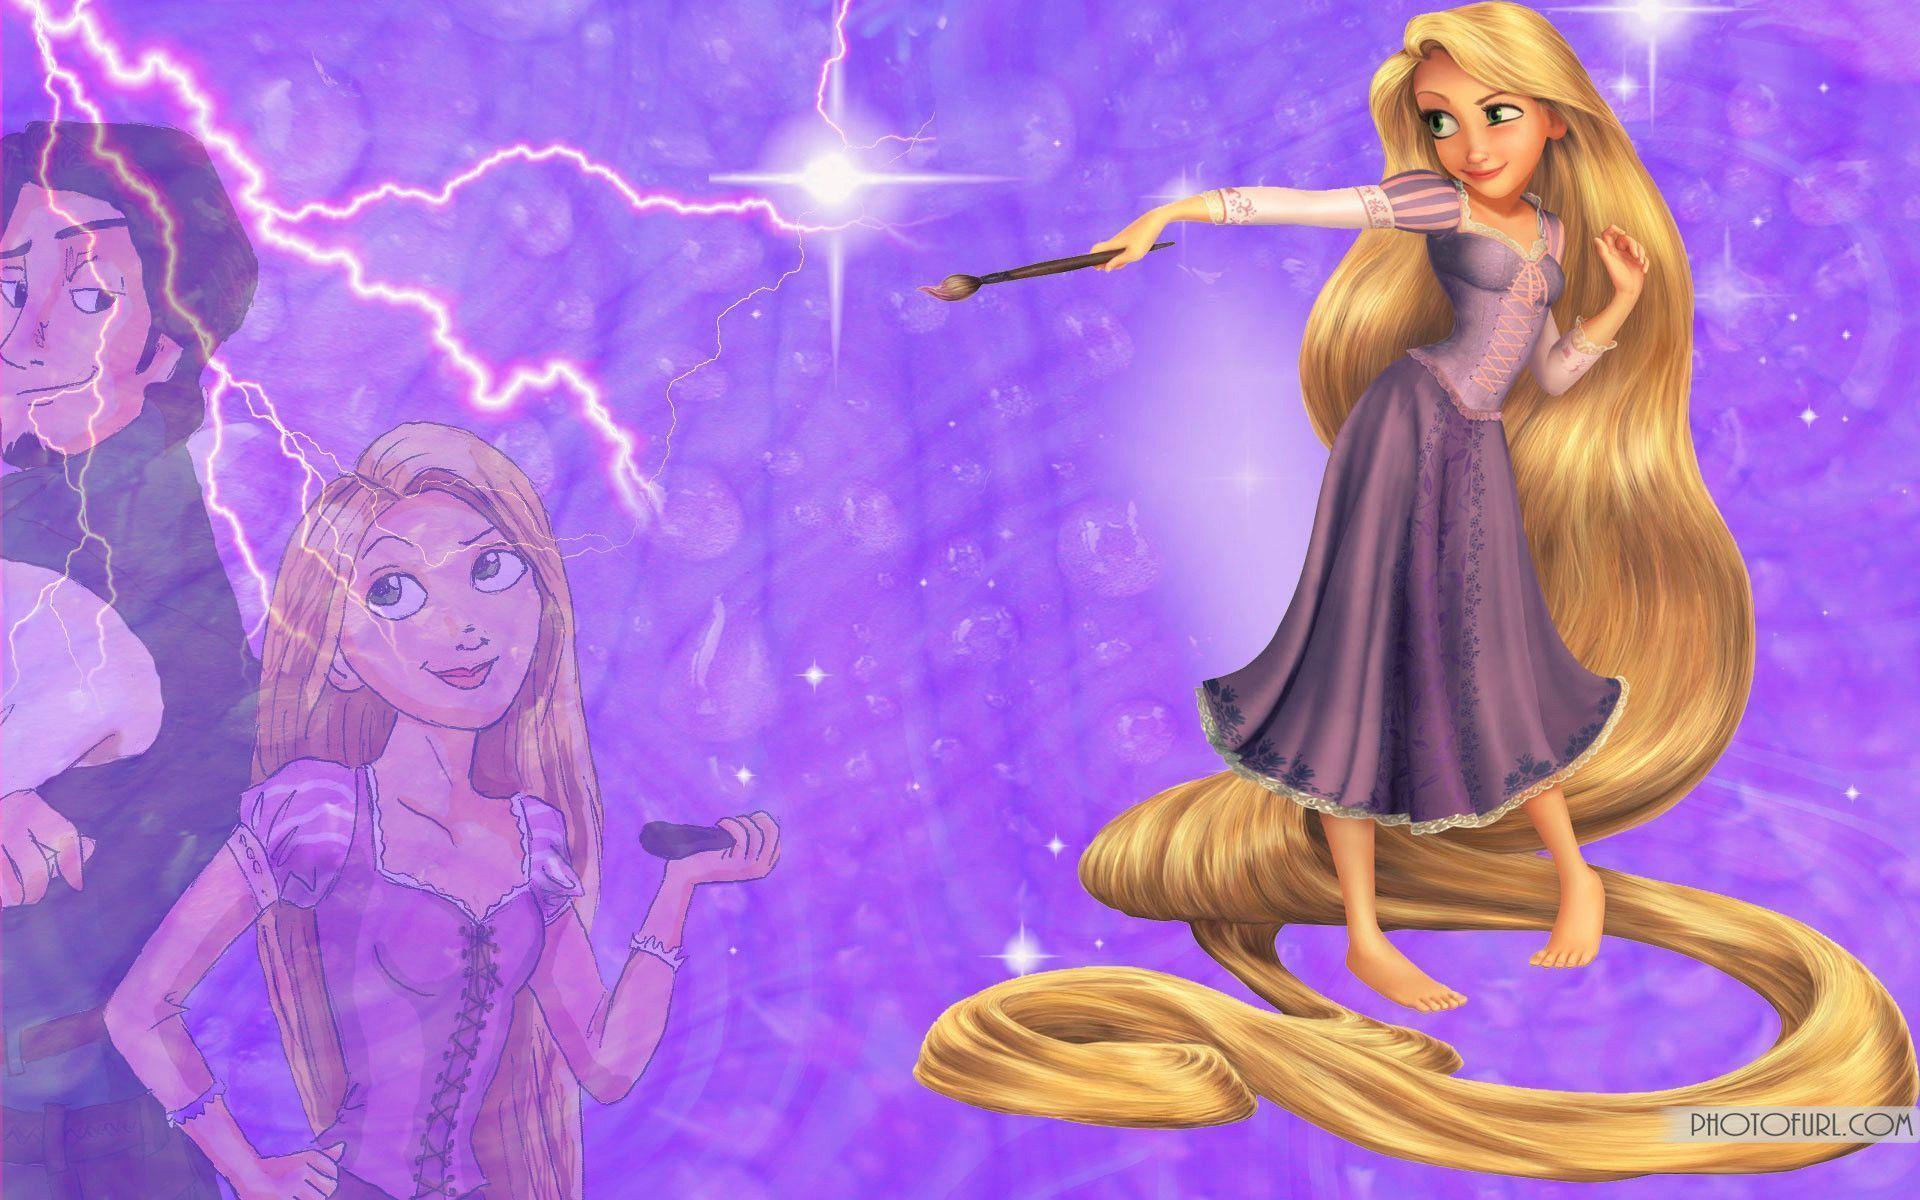 Rapunzel Wallpapers - Wallpaper Cave